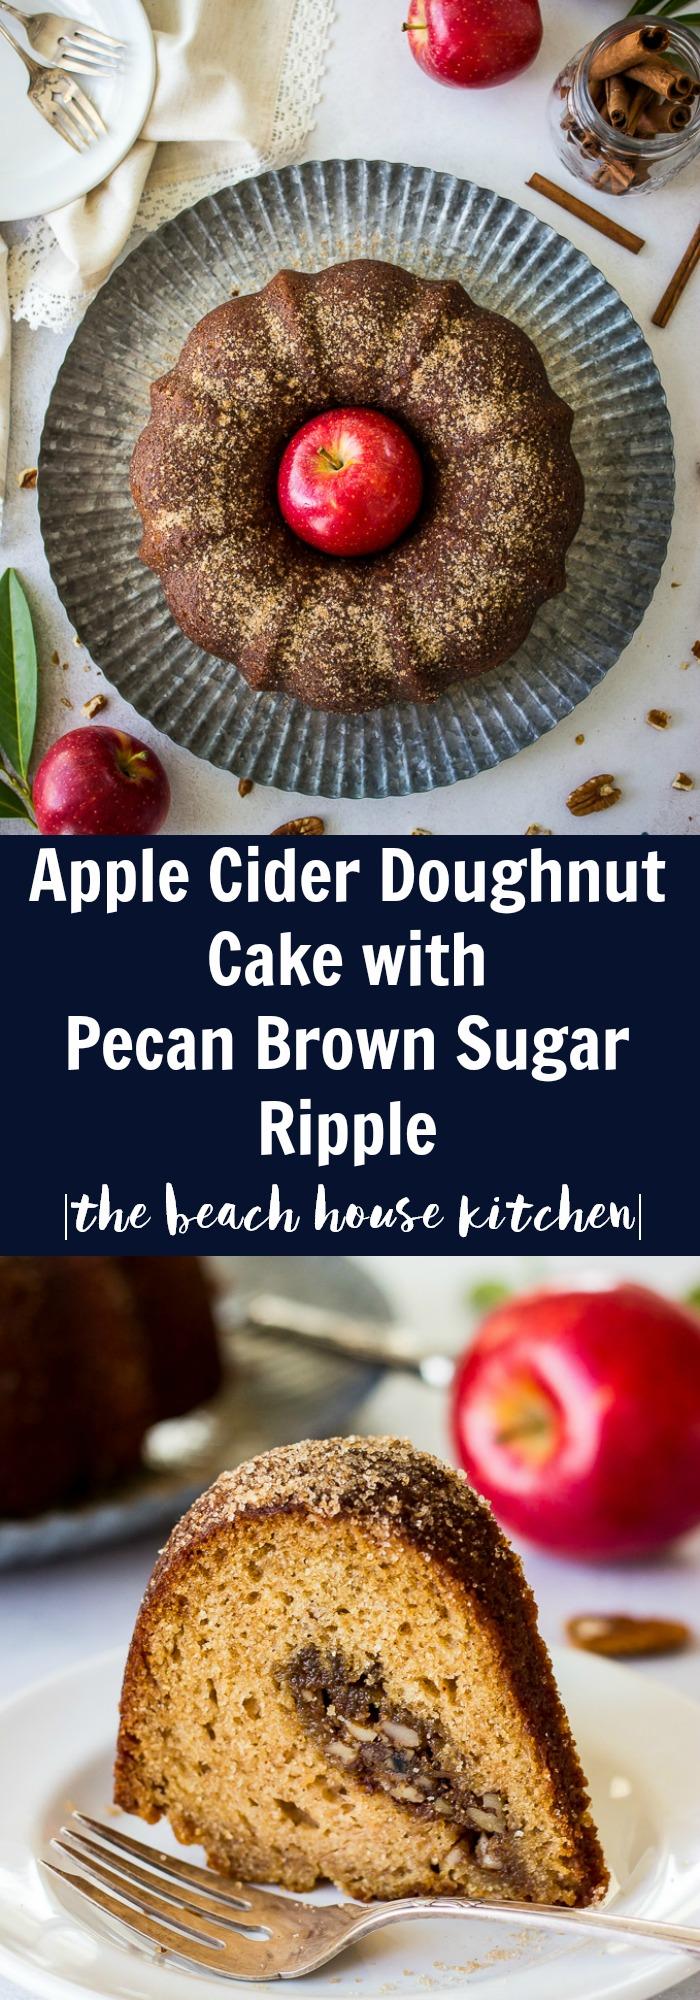 Apple Cider Doughnut Cake with Pecan Brown Sugar Ripple